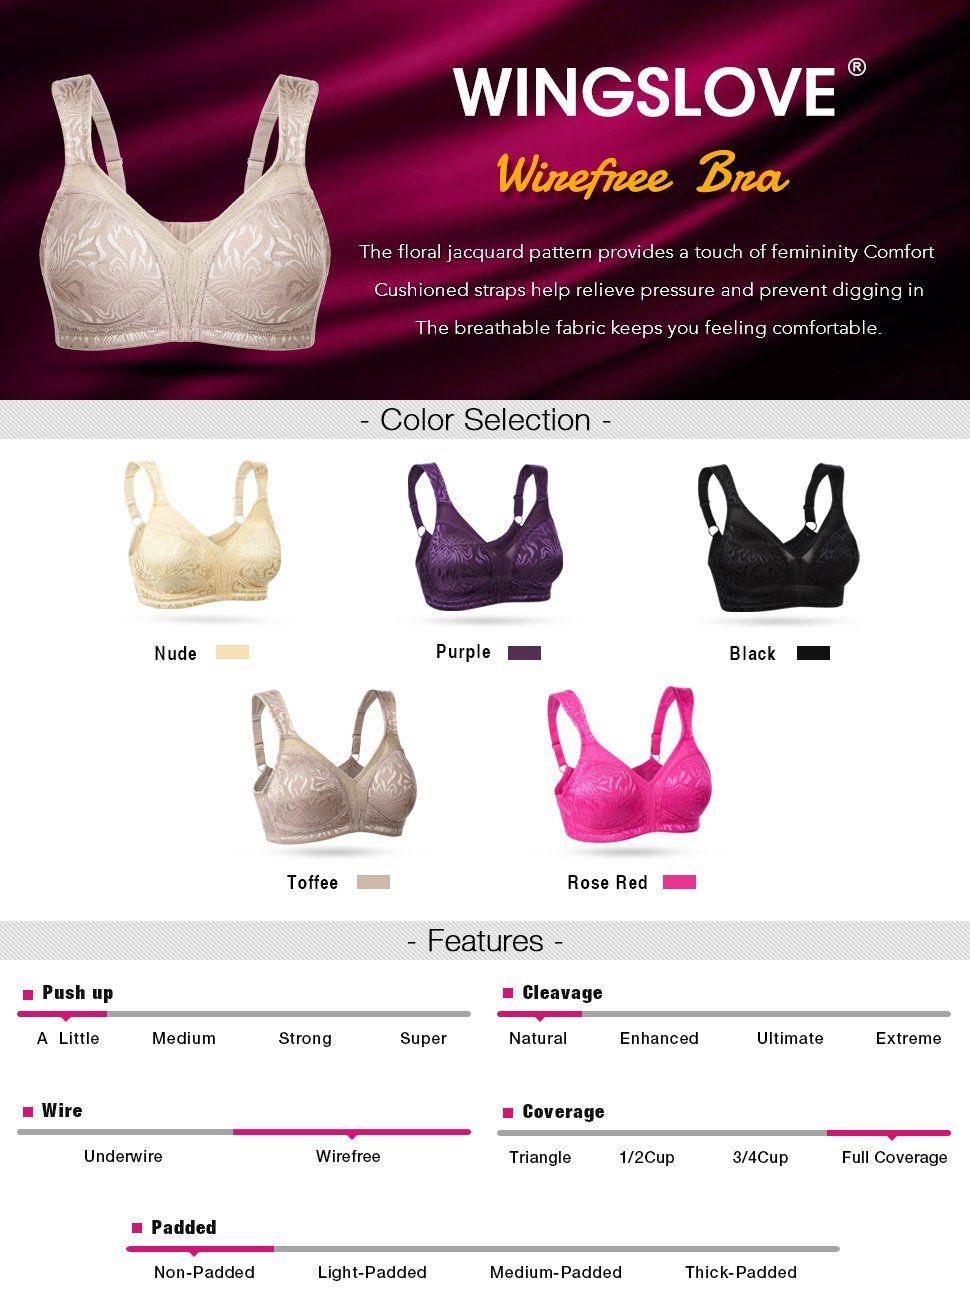 aba73e5d0 WingsLove Women s Full Coverage Non Padded Comfort Strap Minimizer  Wire-Free Bra(Nude